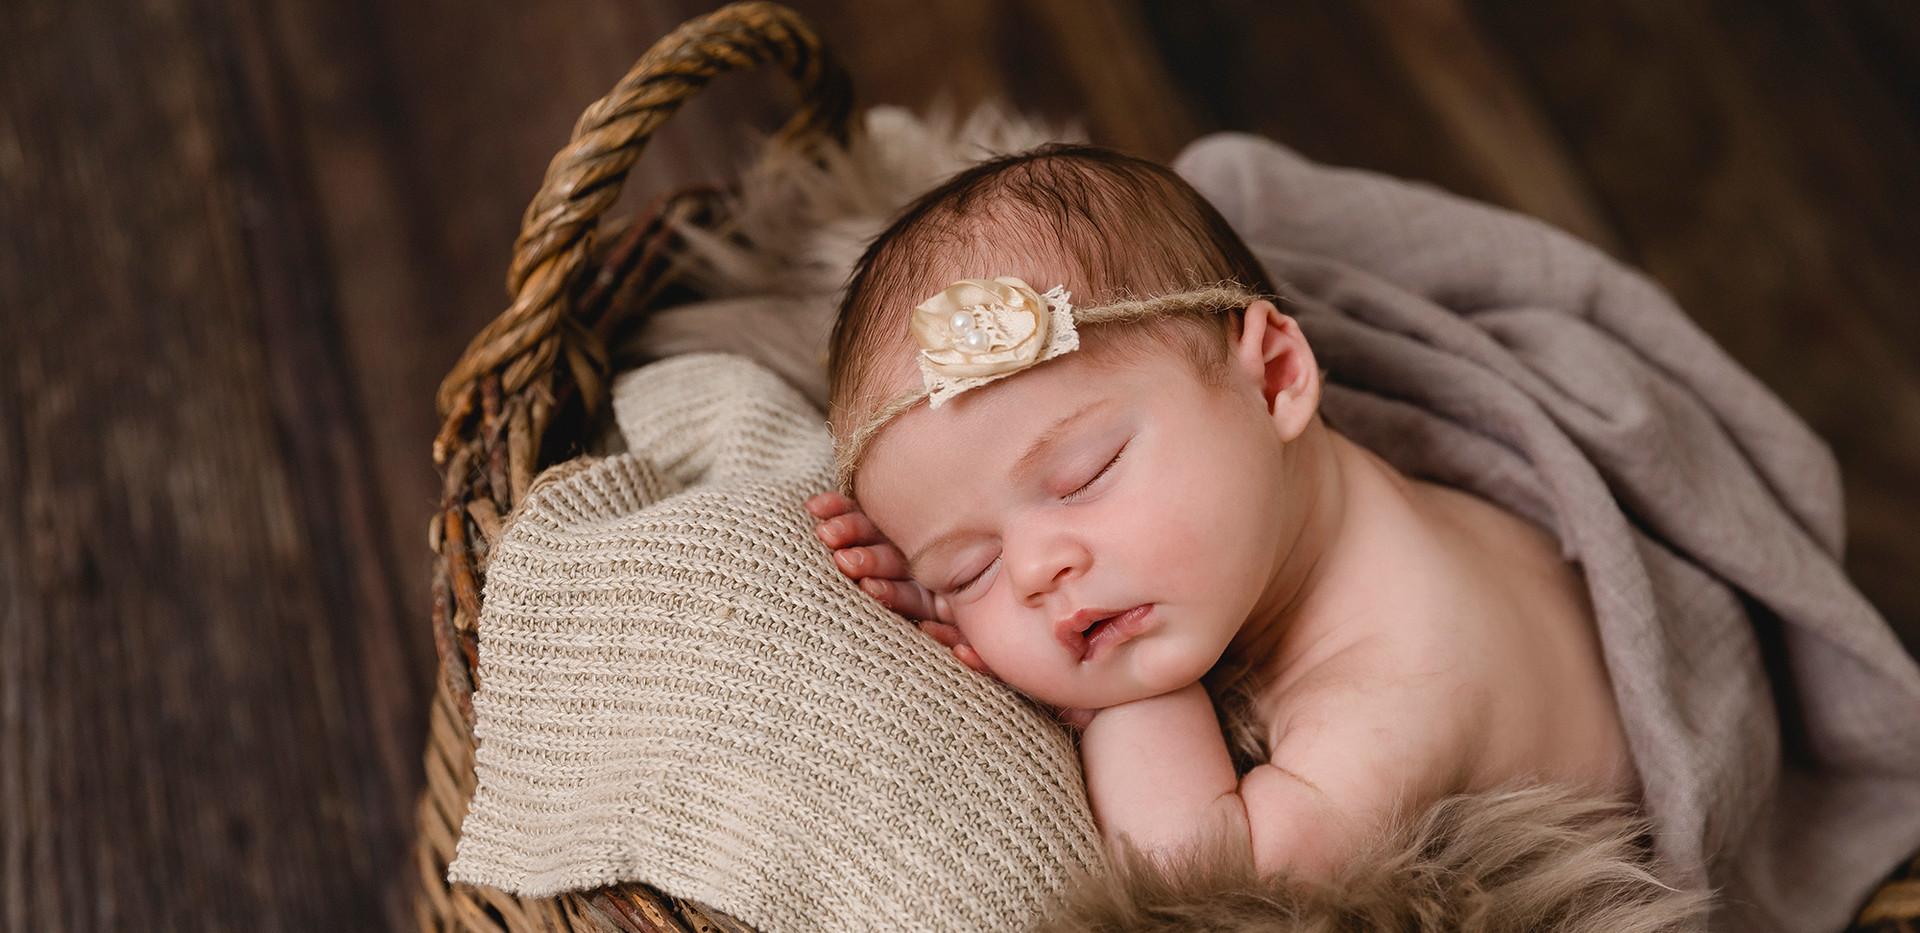 Newborn, Baby, Newbornshooting, Neugeborenenfotografie, Neugeborenes, schlafendes Baby, schlafendes Newborn, Babygirl, Korb, Babyhaarband, Babyfotos, Babyshooting, Babyfotografie, Babyfotos Wien, Babyfotos Korneuburg, Babyfotos Tulln